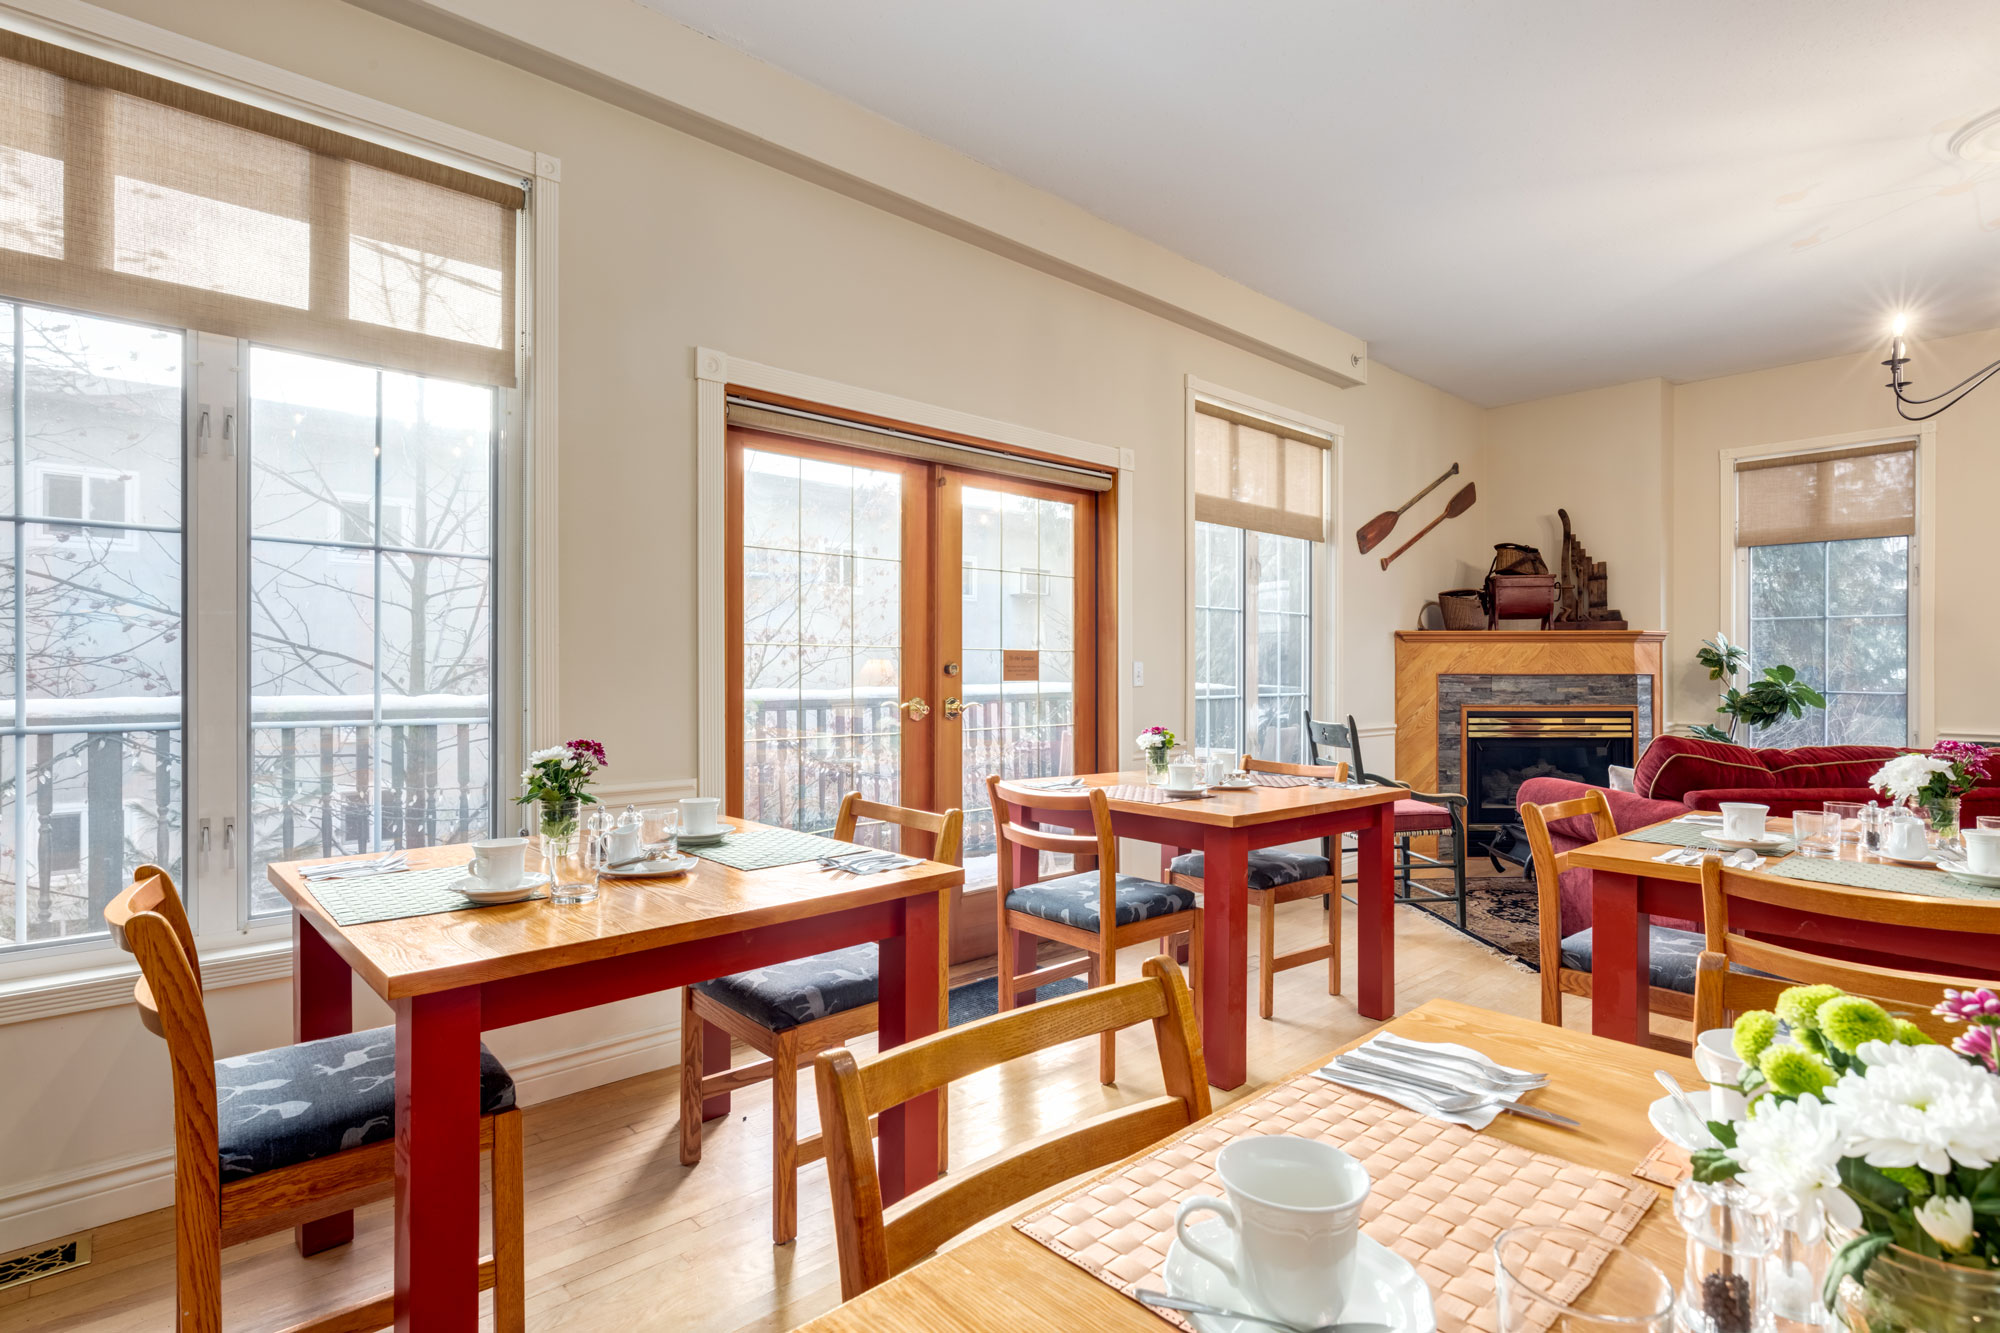 Dine and enjoy Breakfast at Courthouse Inn, Revelstoke, BC